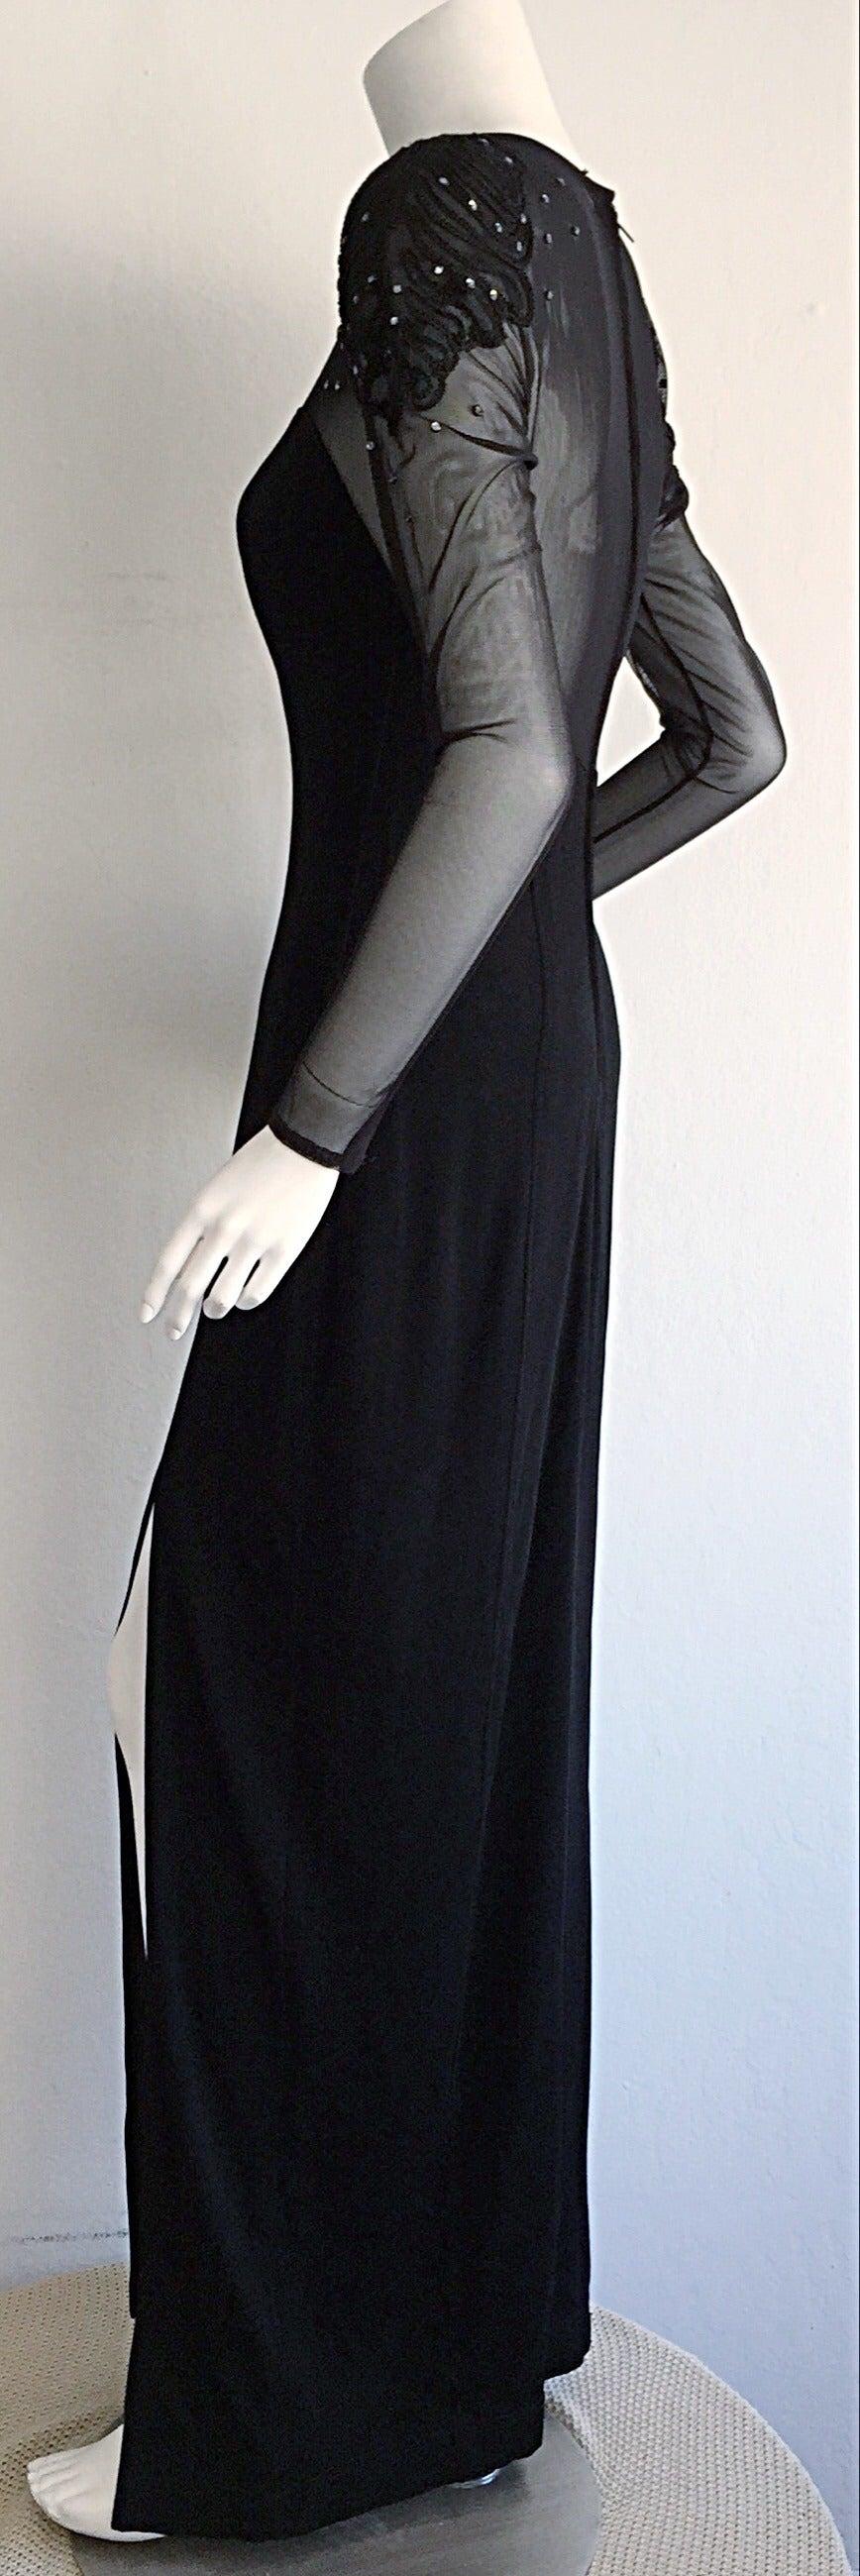 Sexy Vintage 1990s Black Cut - Out Bodycon Dress w/ Rhinestones 7